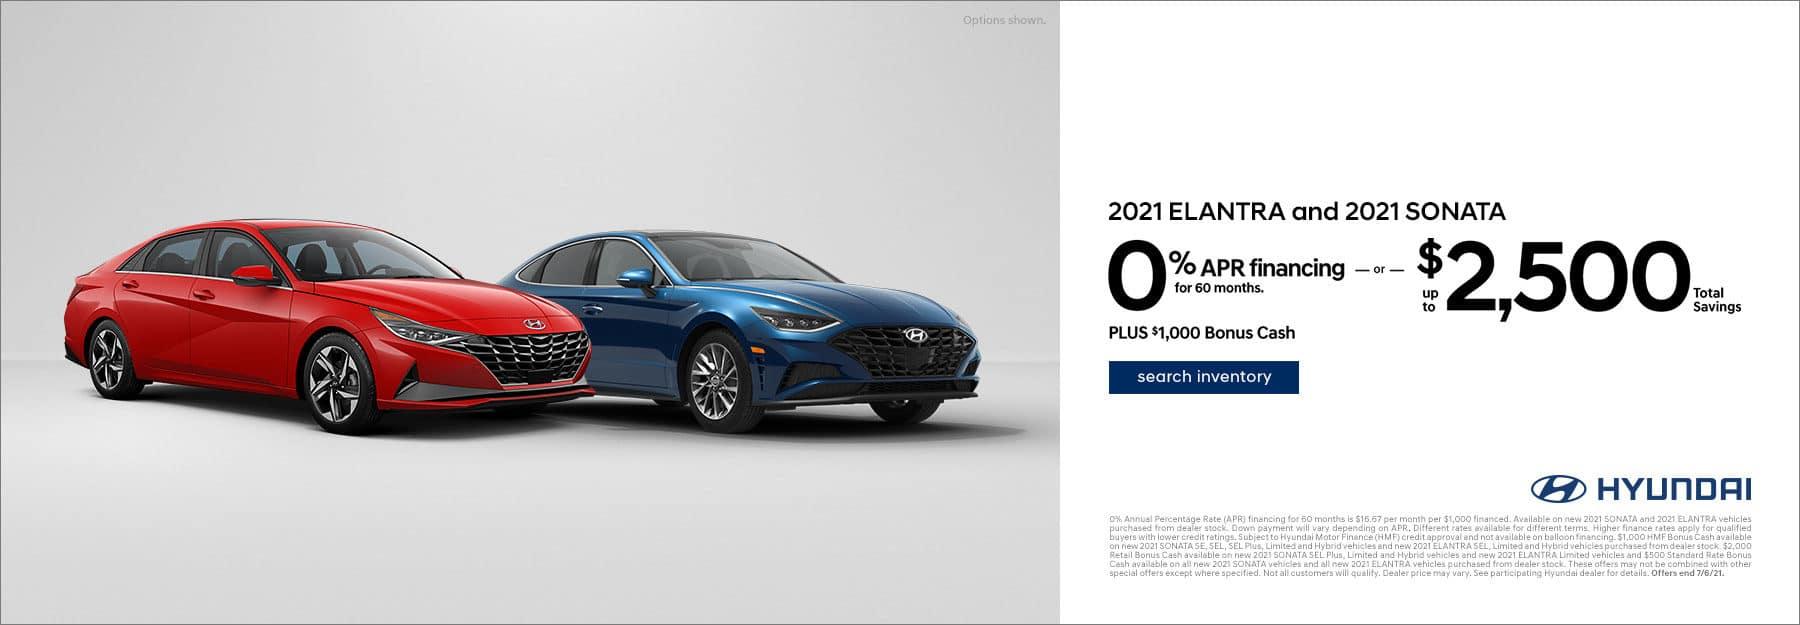 2021 Hyundai Elantra & Sonata offer